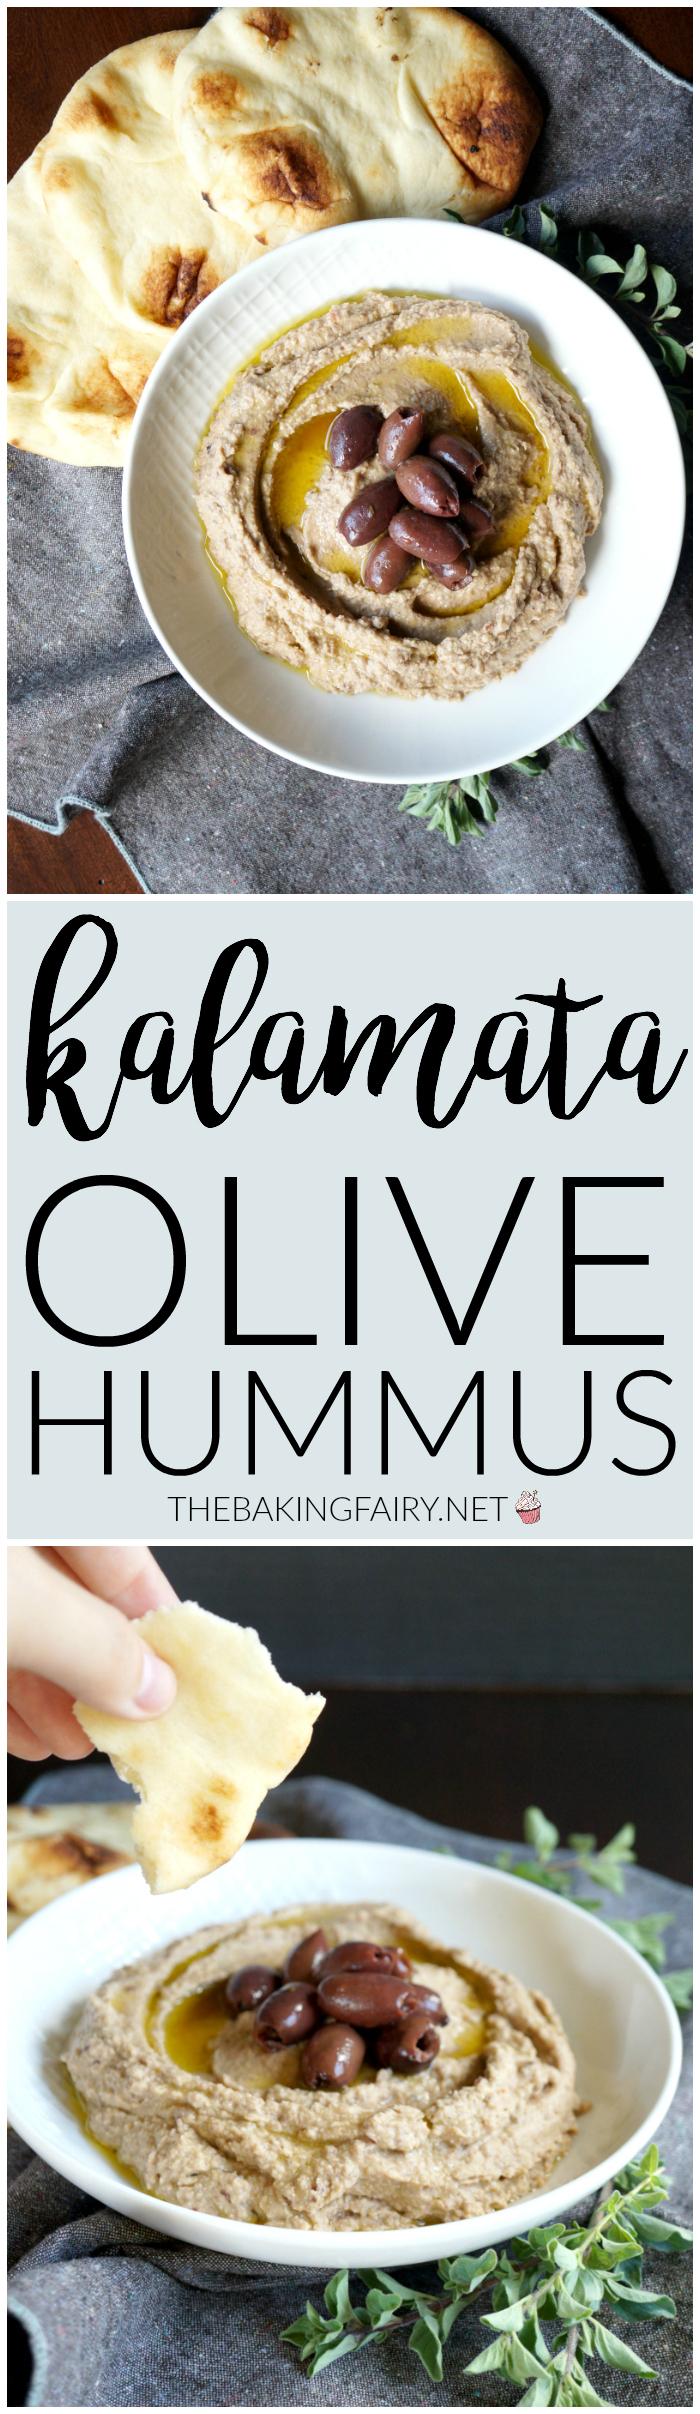 kalamata olive hummus | The Baking Fairy